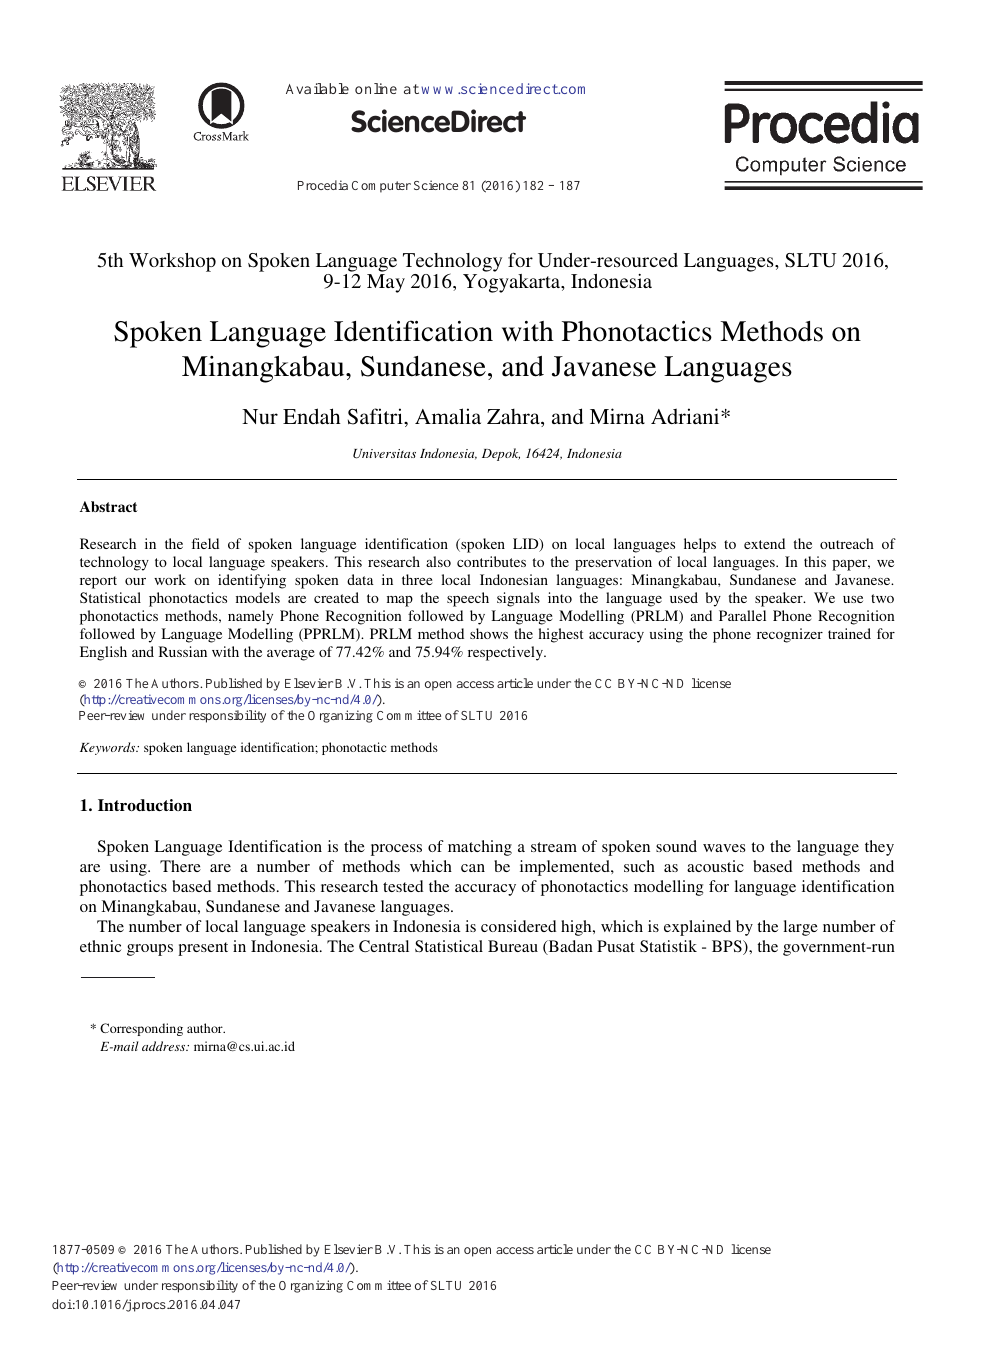 Spoken Language Identification with Phonotactics Methods on